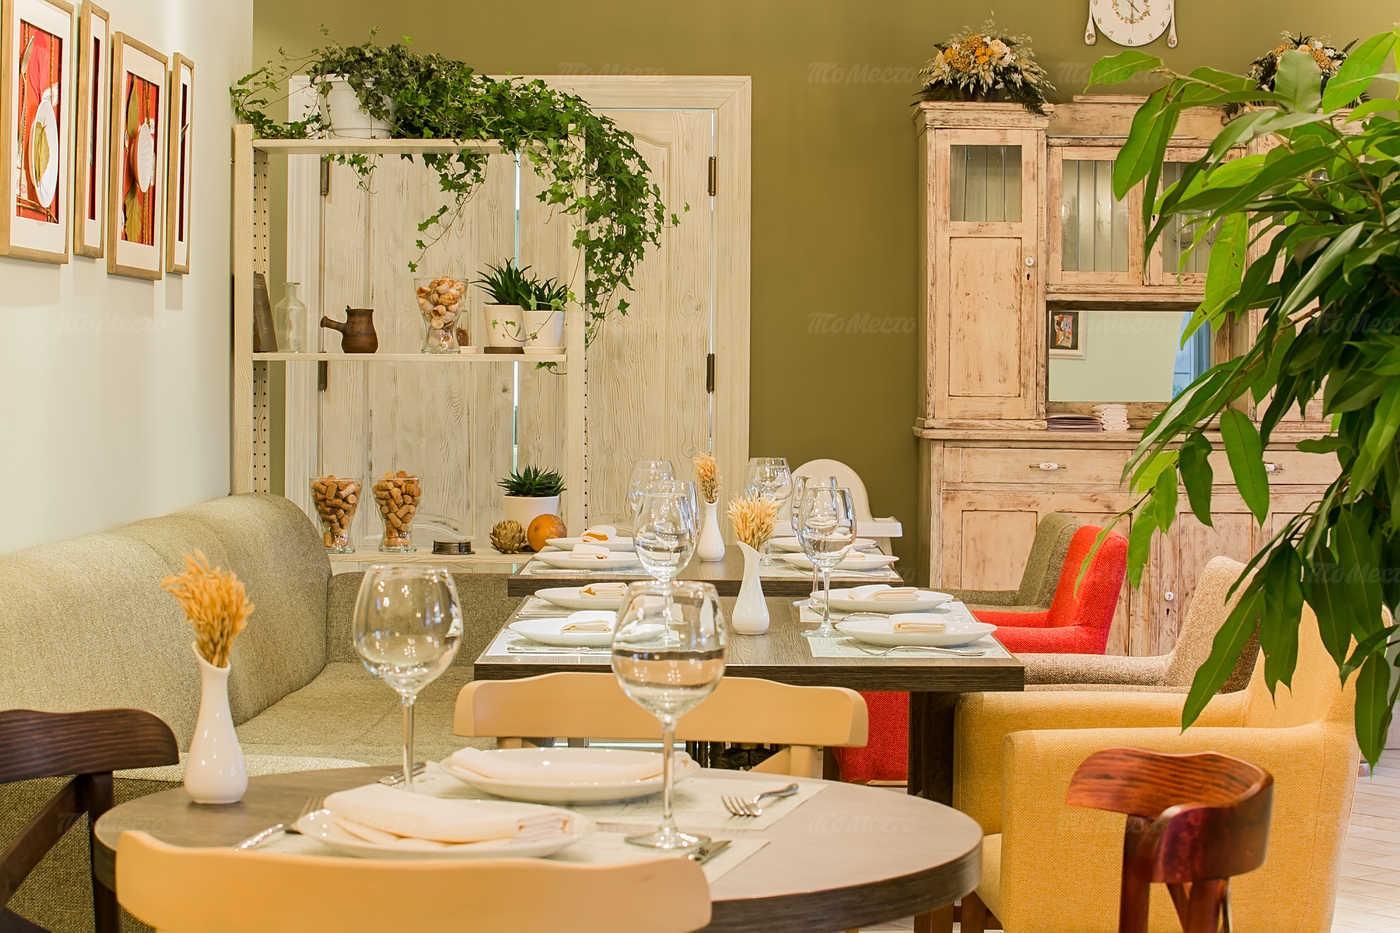 Меню ресторана Forchetta (Форкетта) на Кемской улице